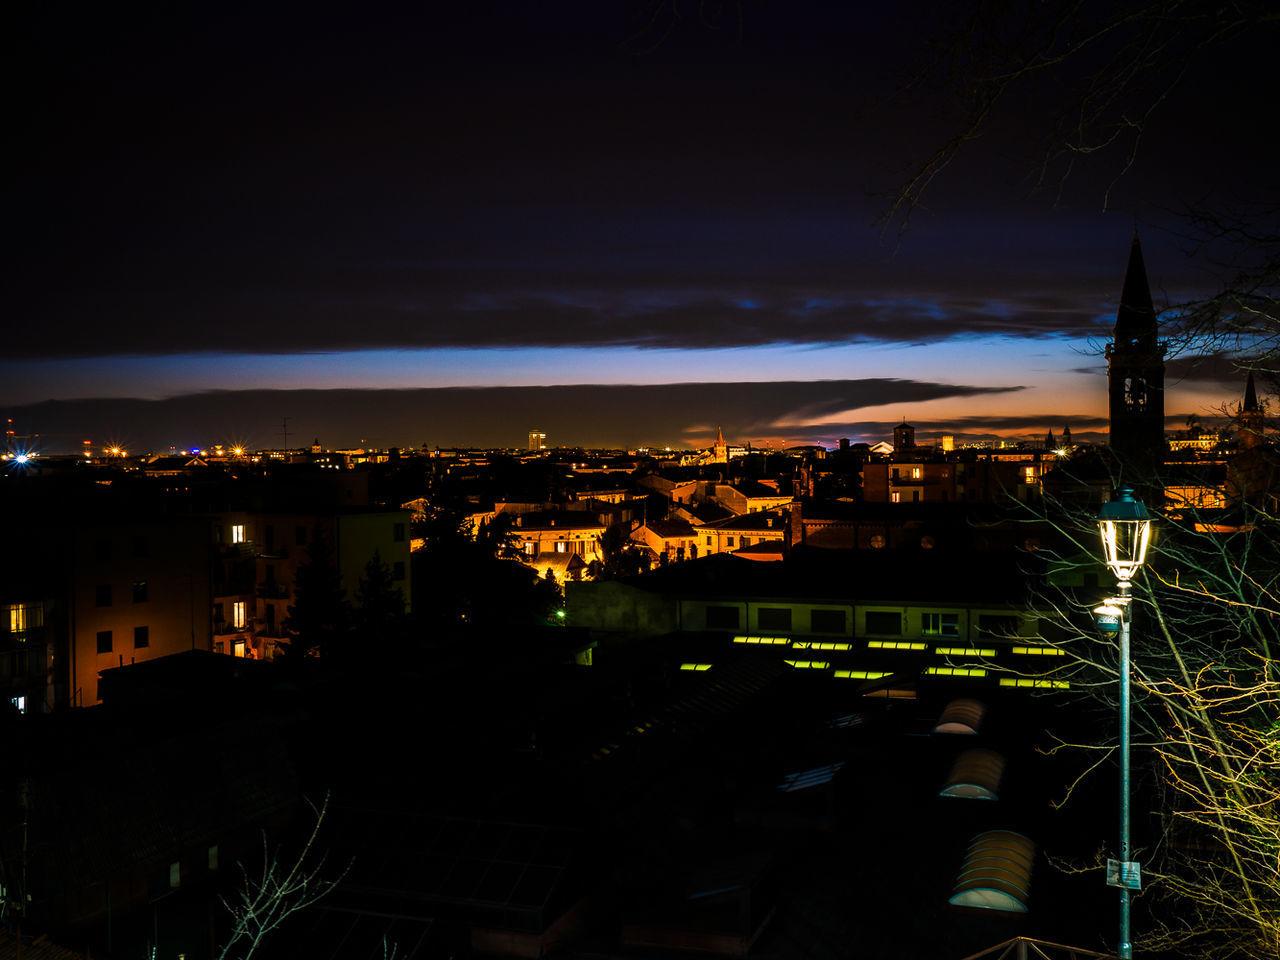 My beloved Verona Eyemitalia Landscape Cityscapes Sunset Italy Panorama Nightphotography Photography Eyem Best Shots Night City Lights Eyemitaly Citynight Cities At Night